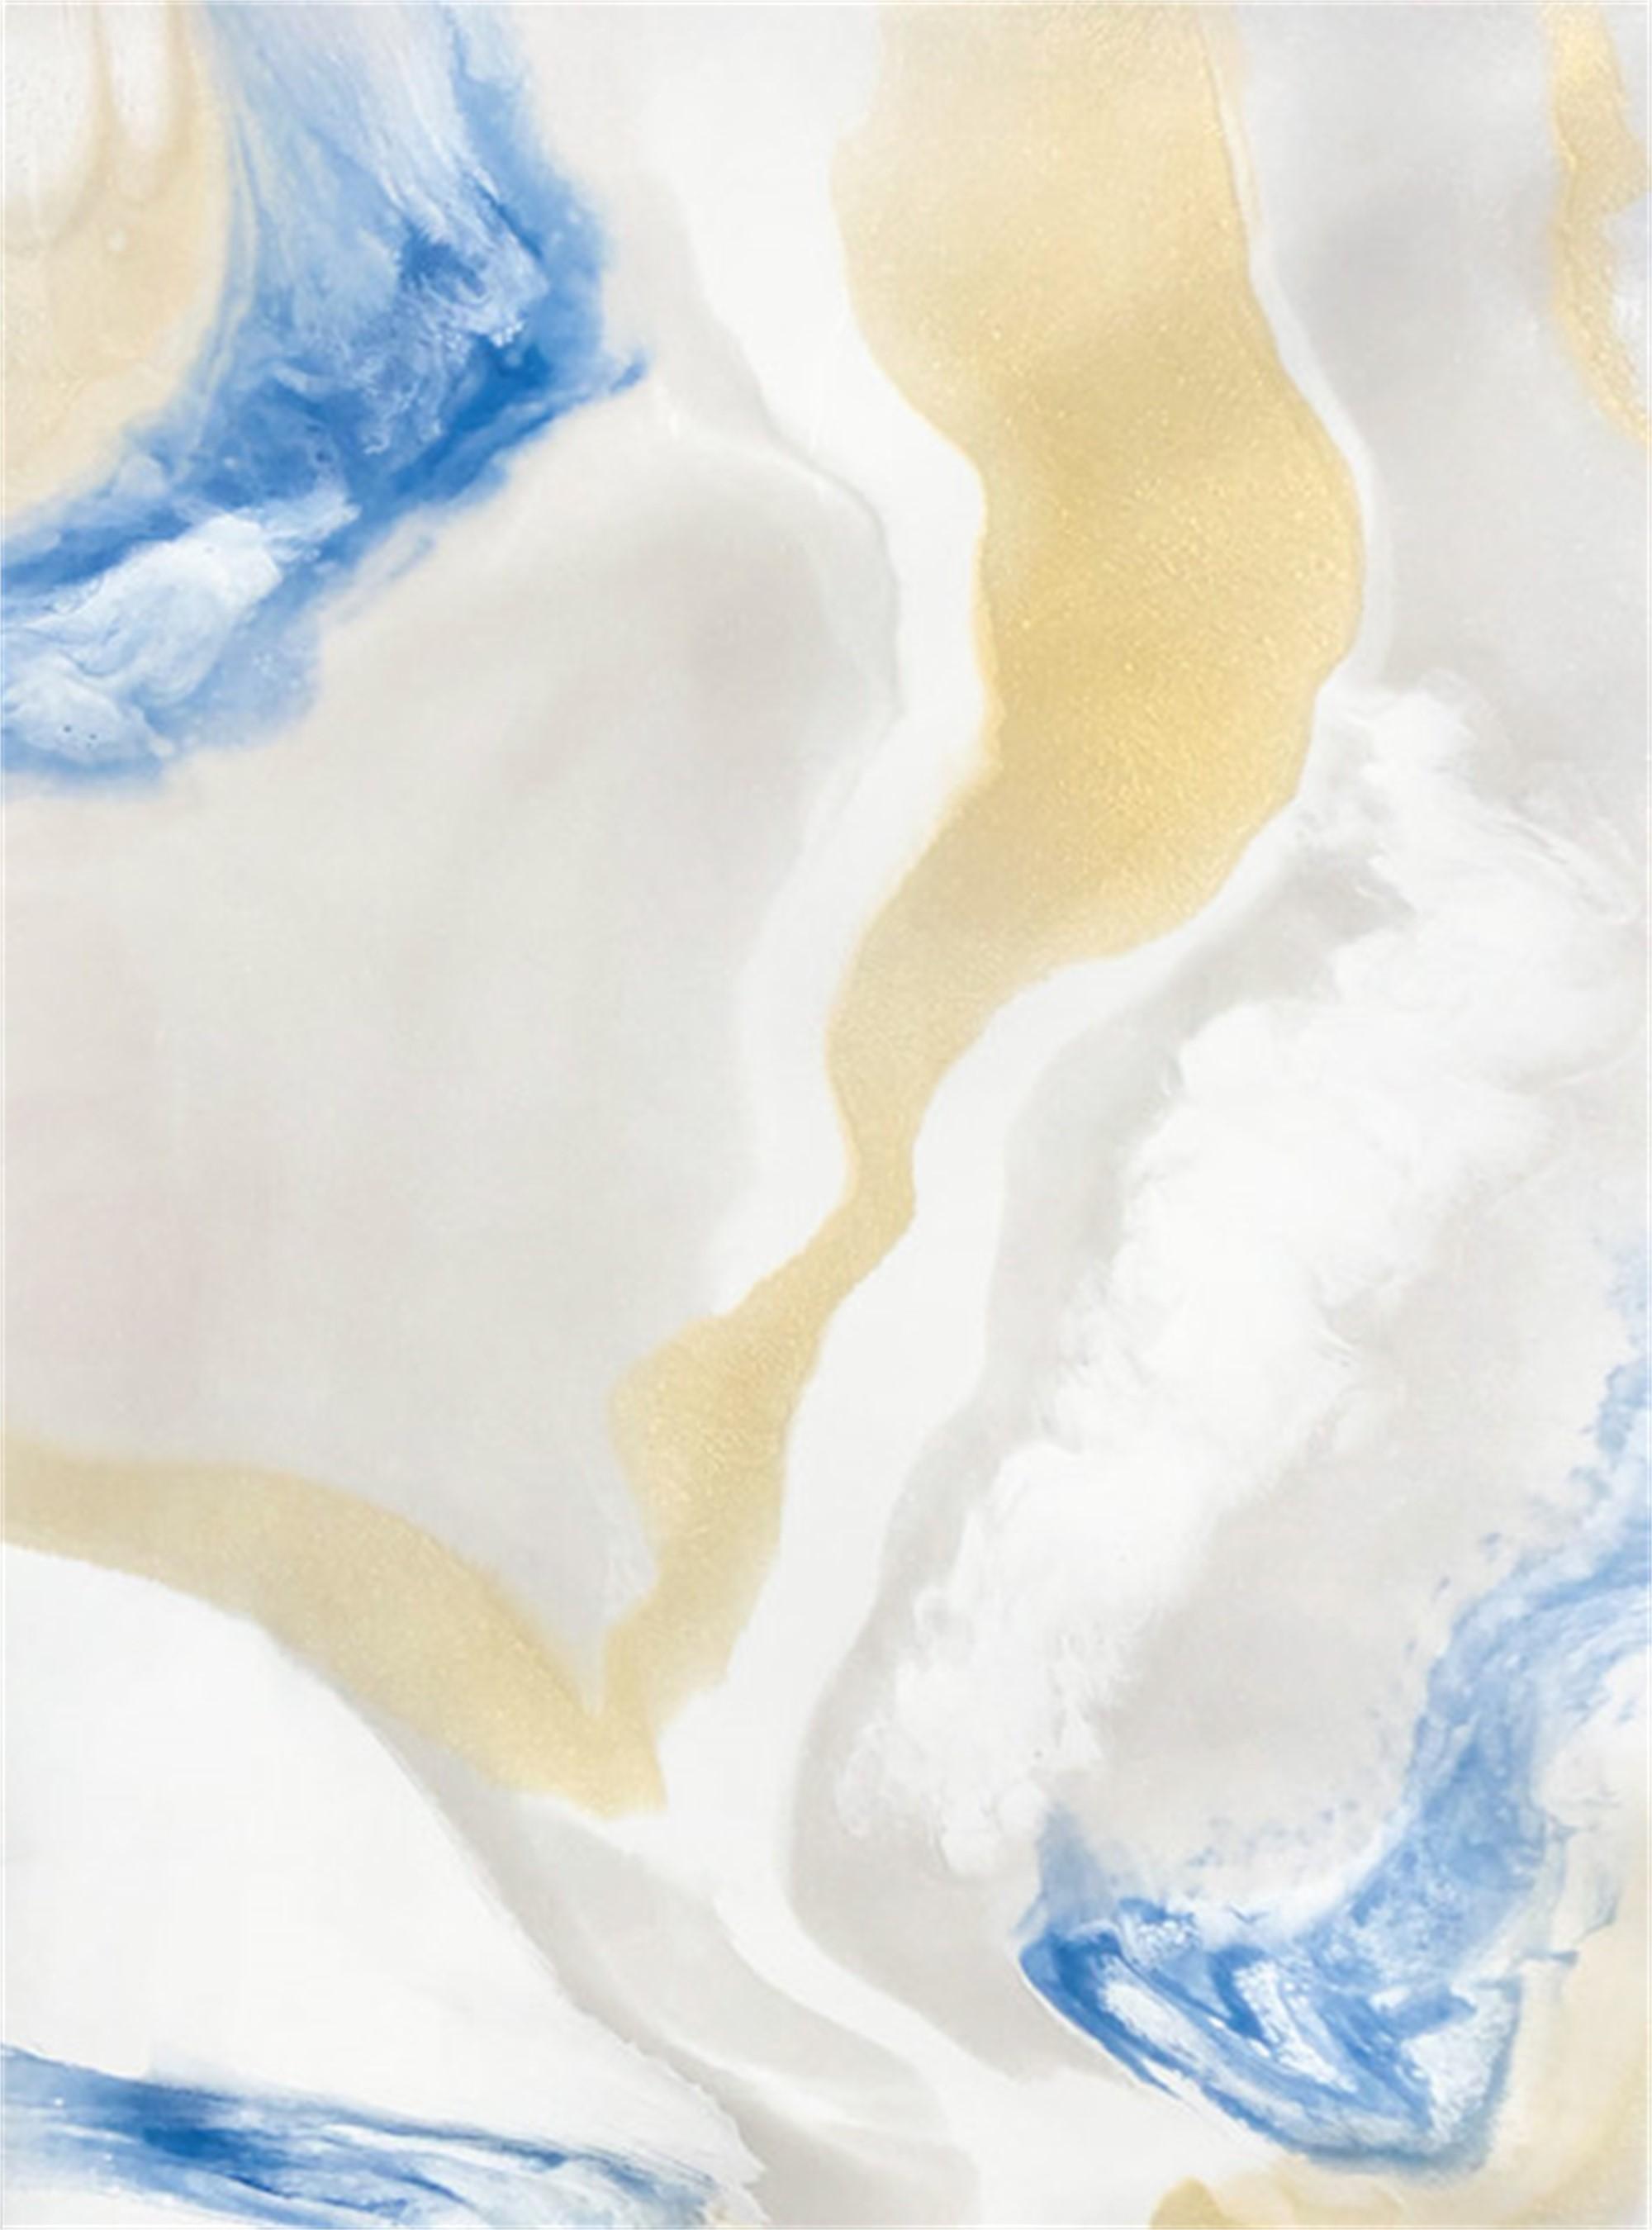 Golden Skies by Andrea Kreeger